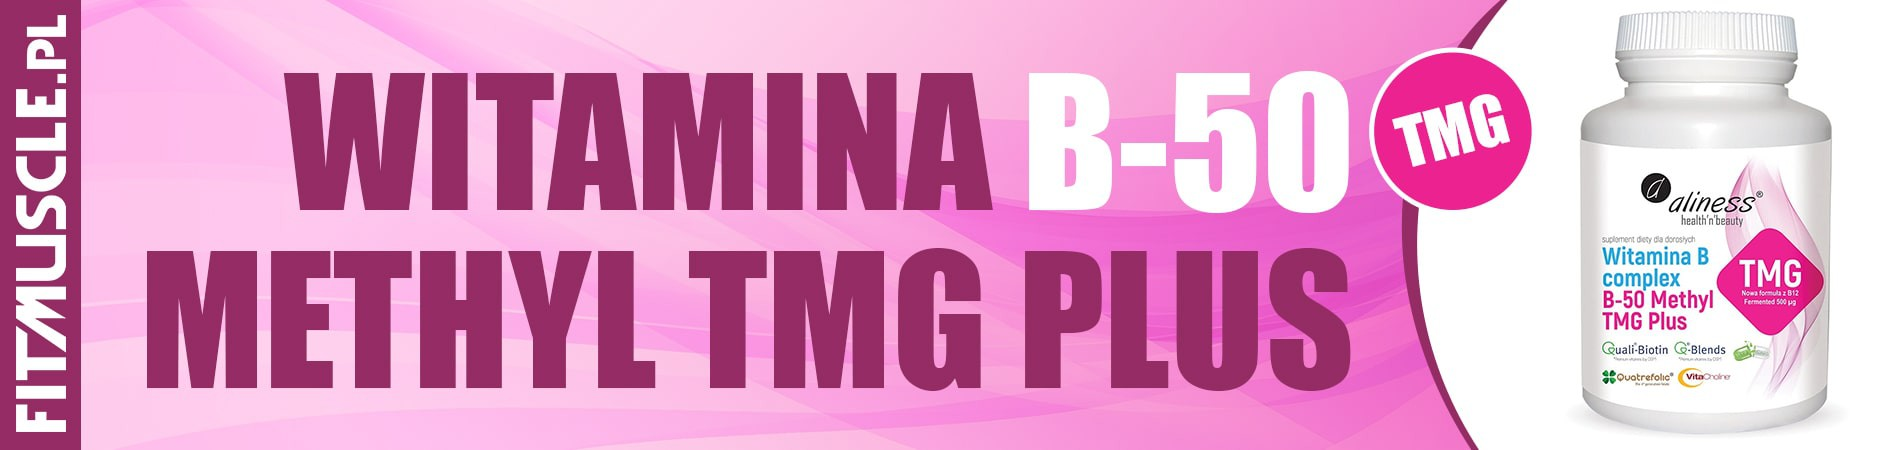 Aliness - Witamina B-50 Methyl - 100caps